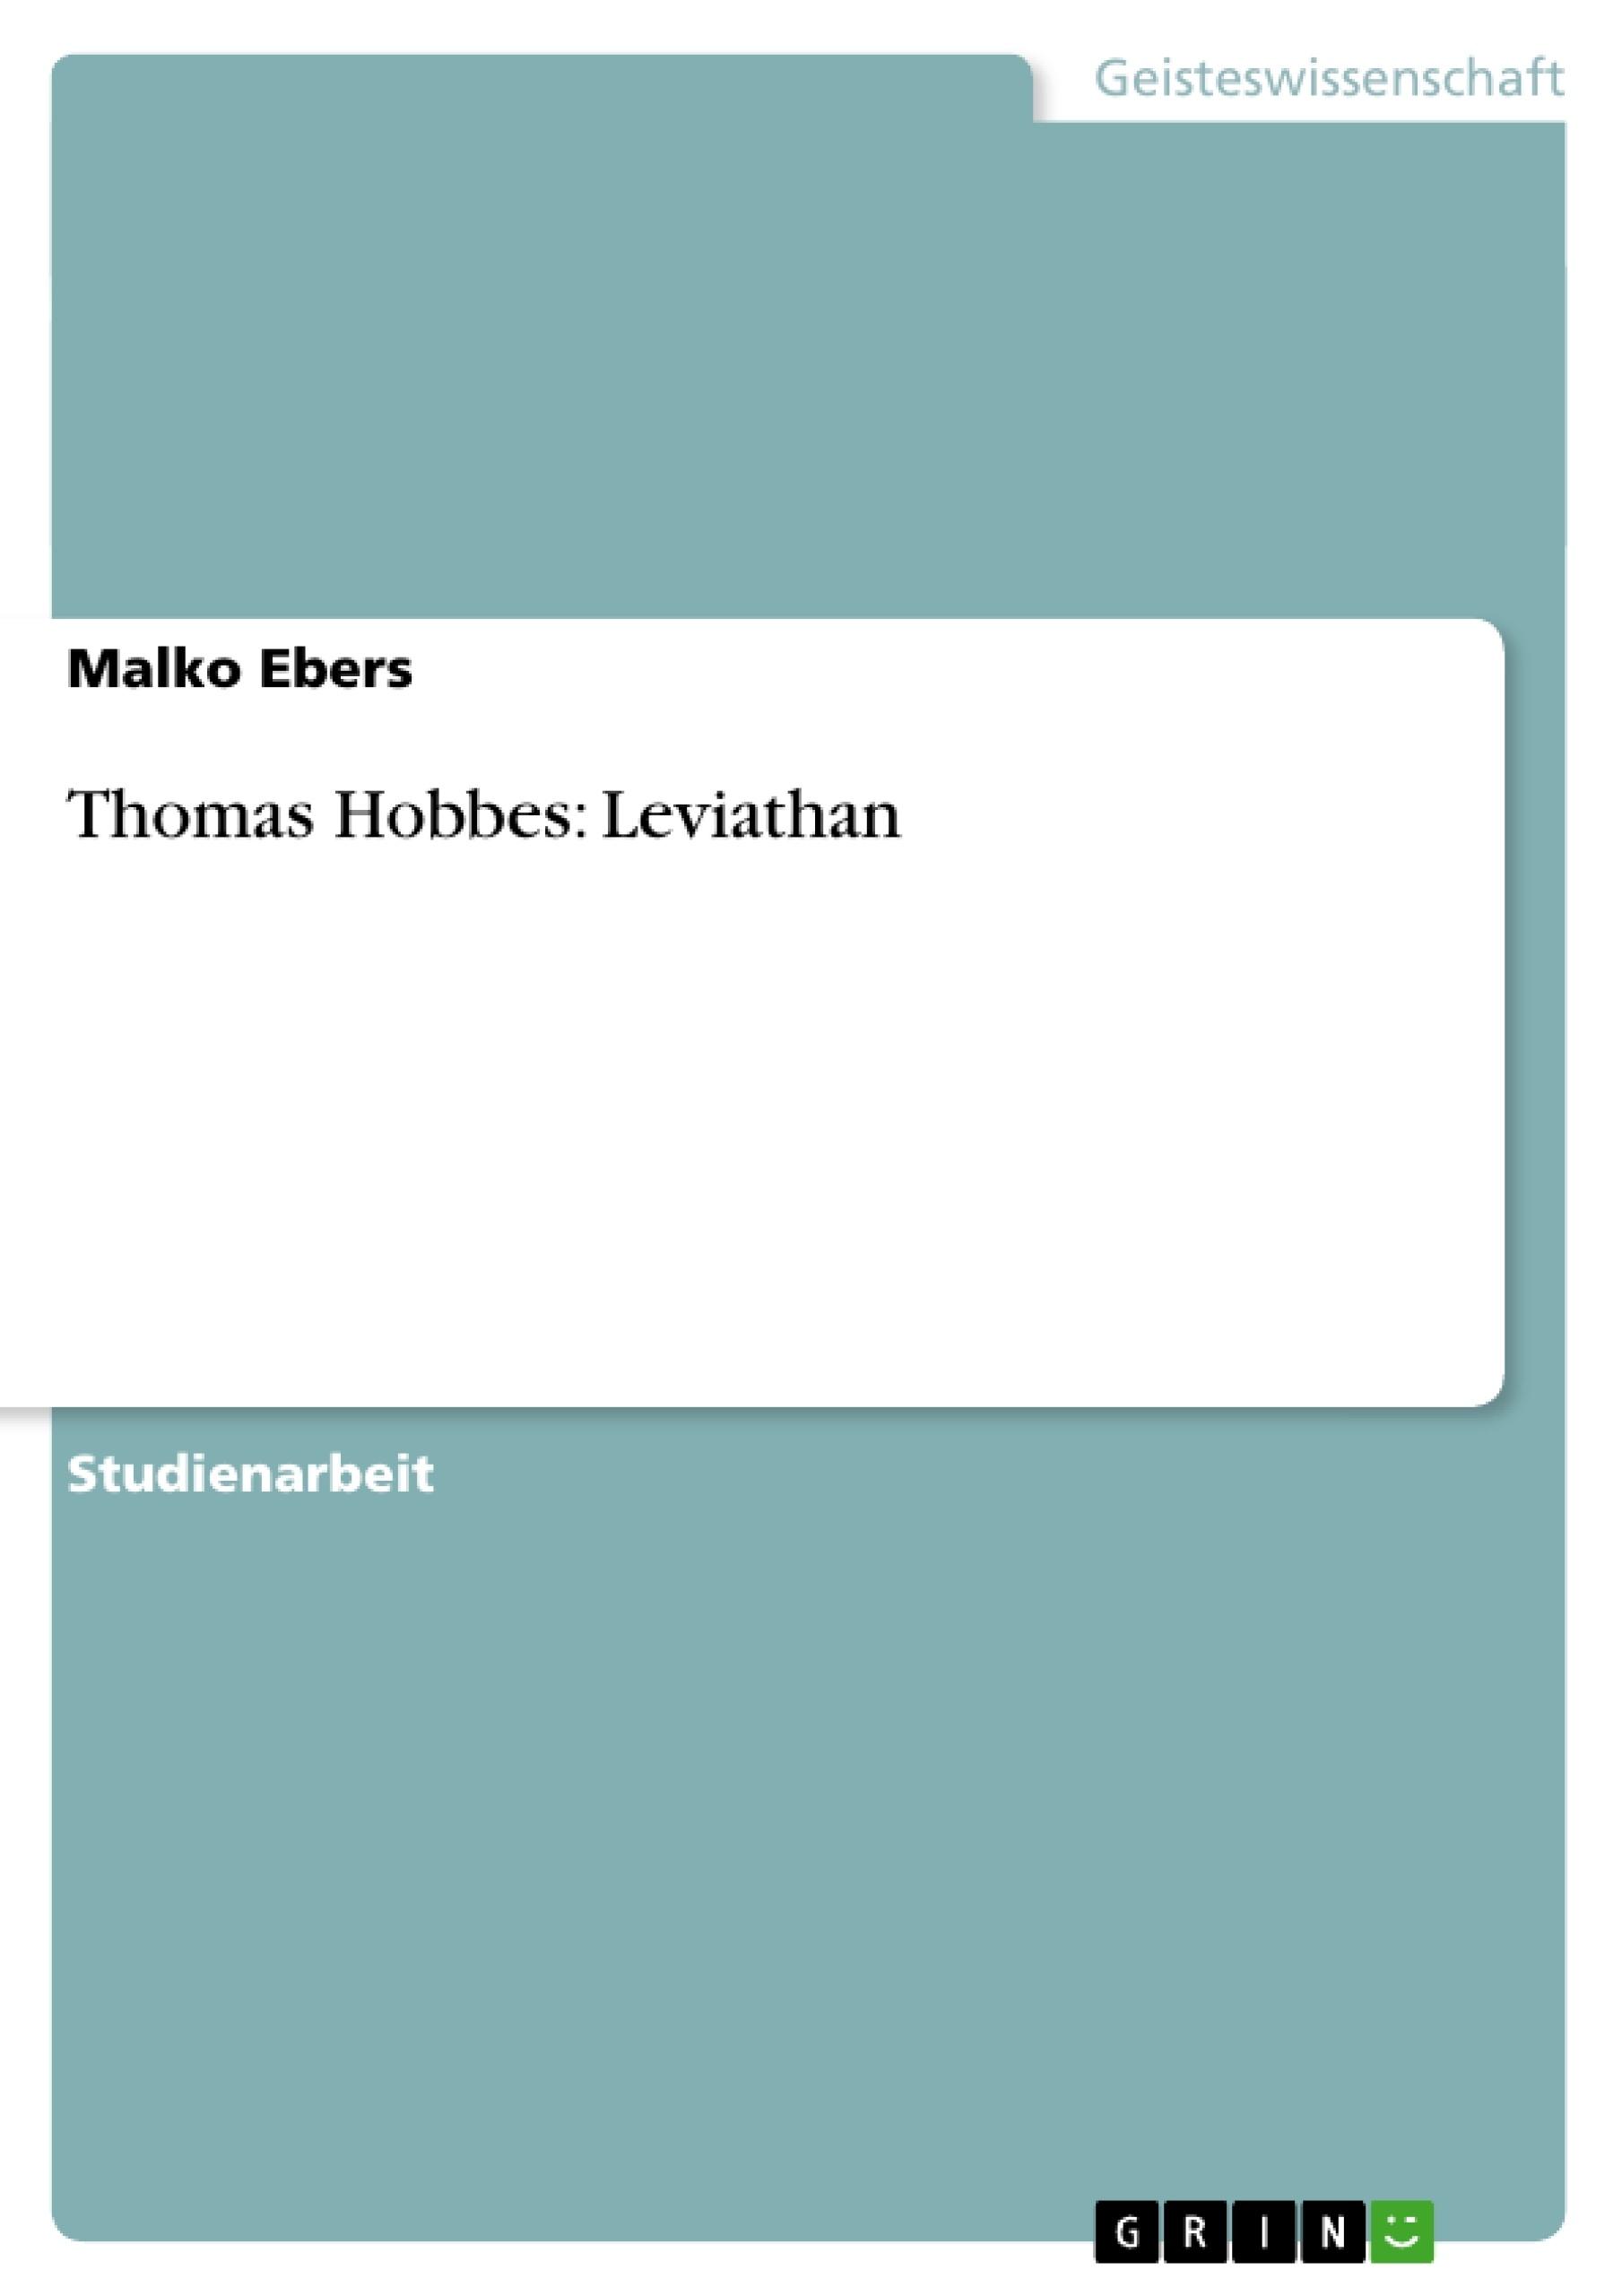 Titel: Thomas Hobbes: Leviathan